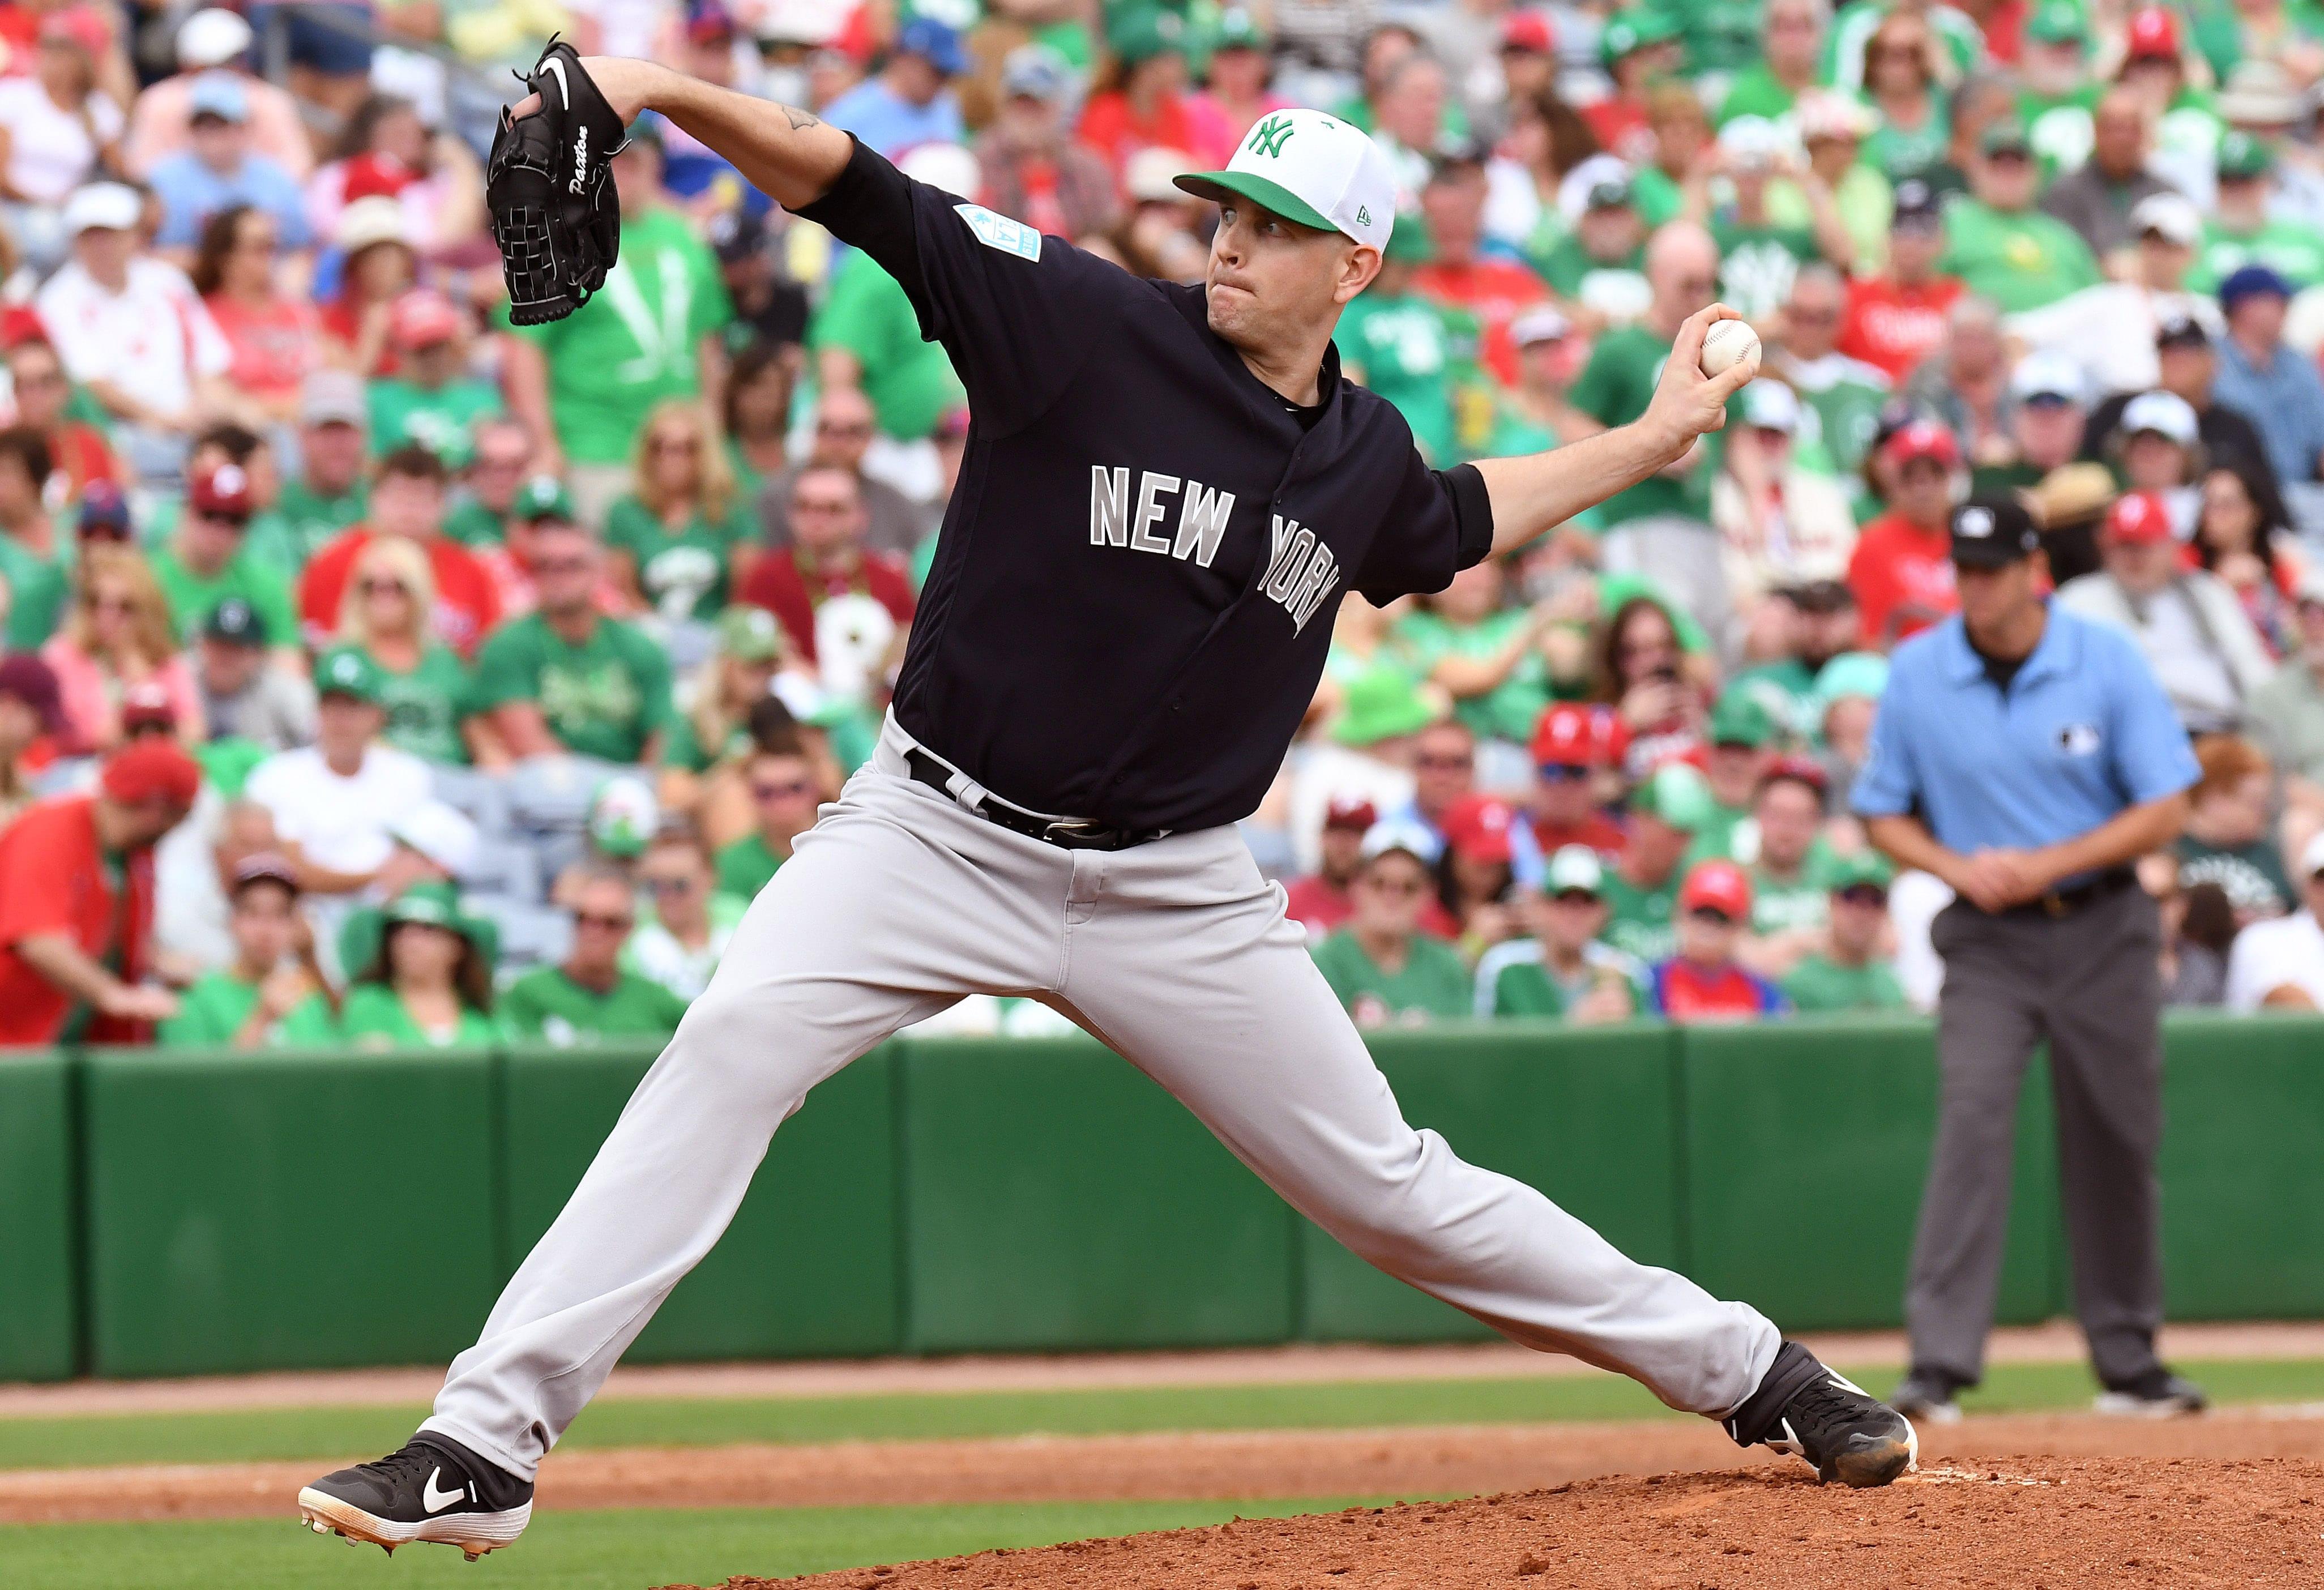 New York Yankees, James Paxton